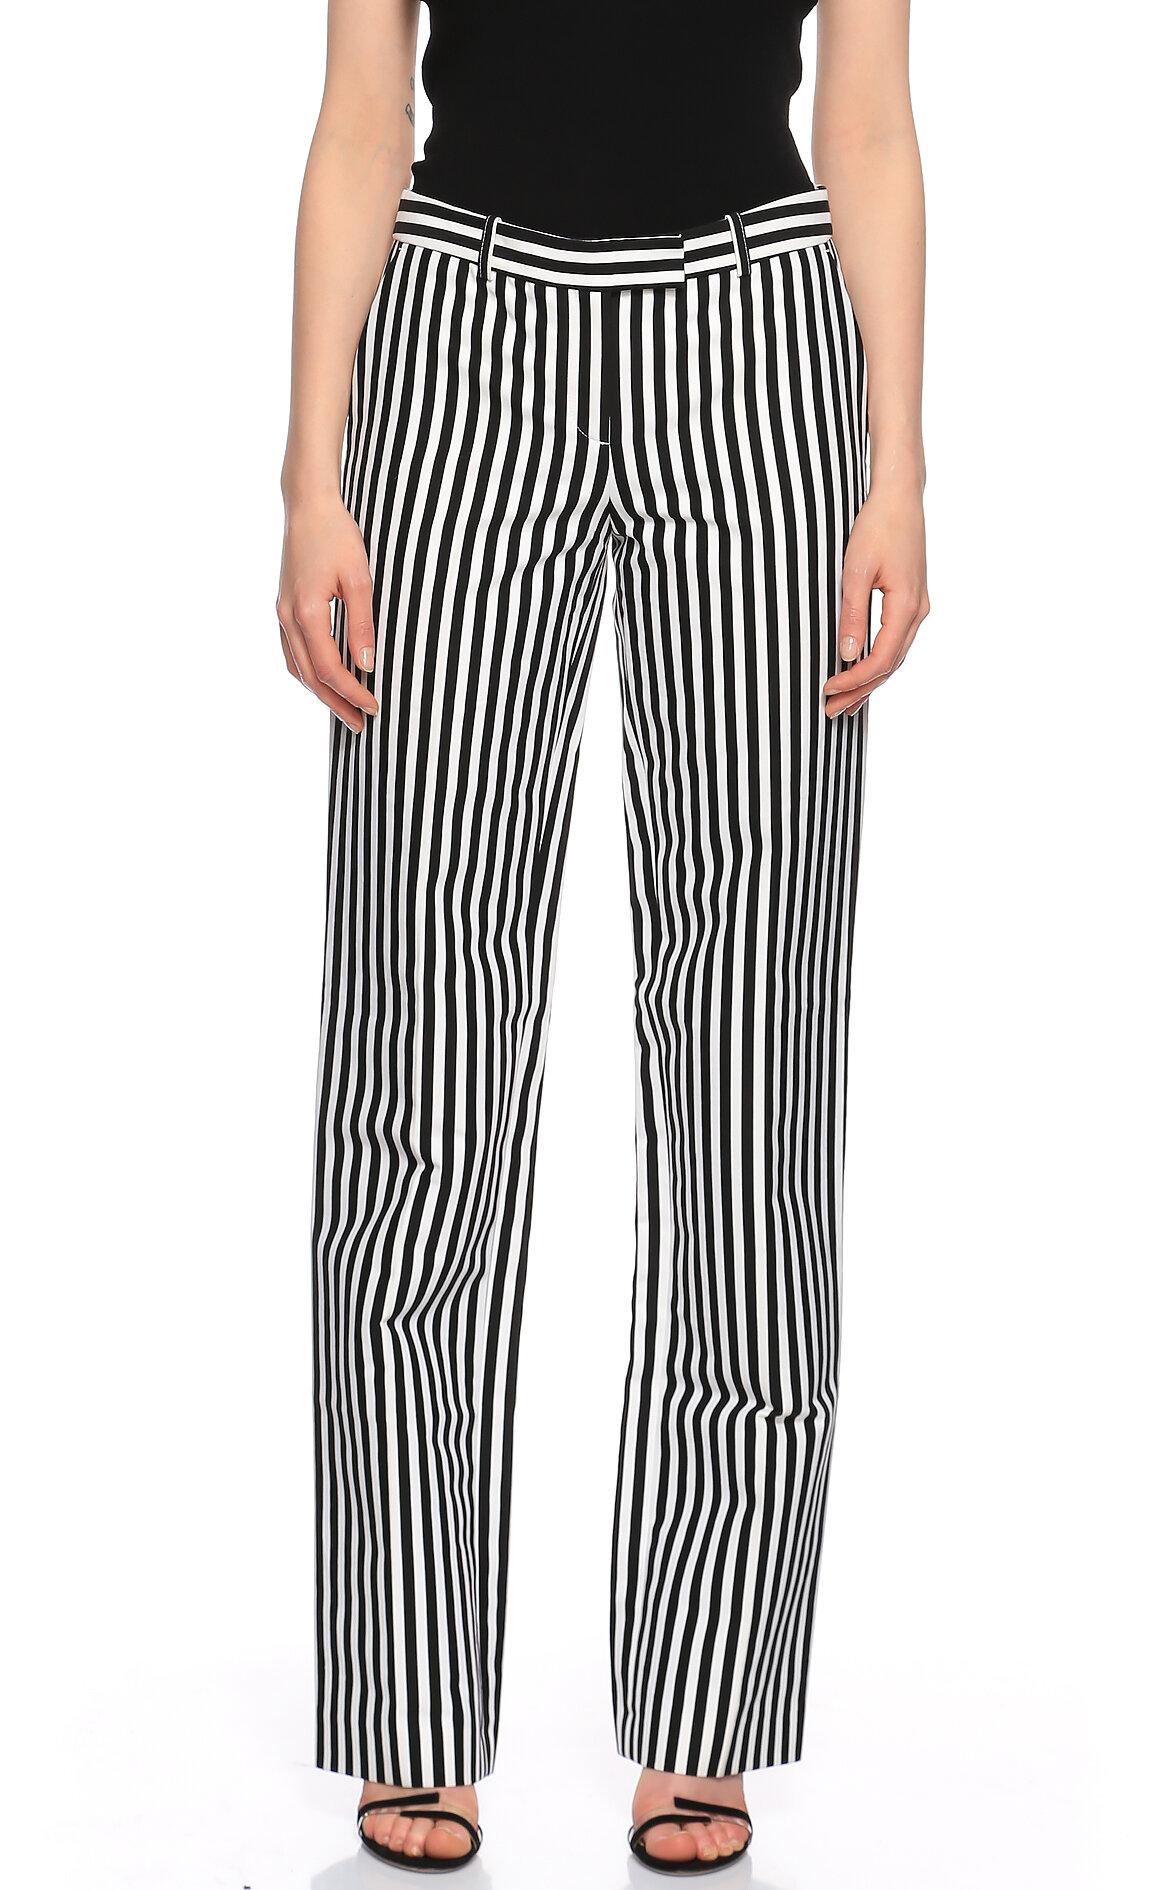 Michael Kors Collection  Çizgili Siyah Beyaz Pantolon